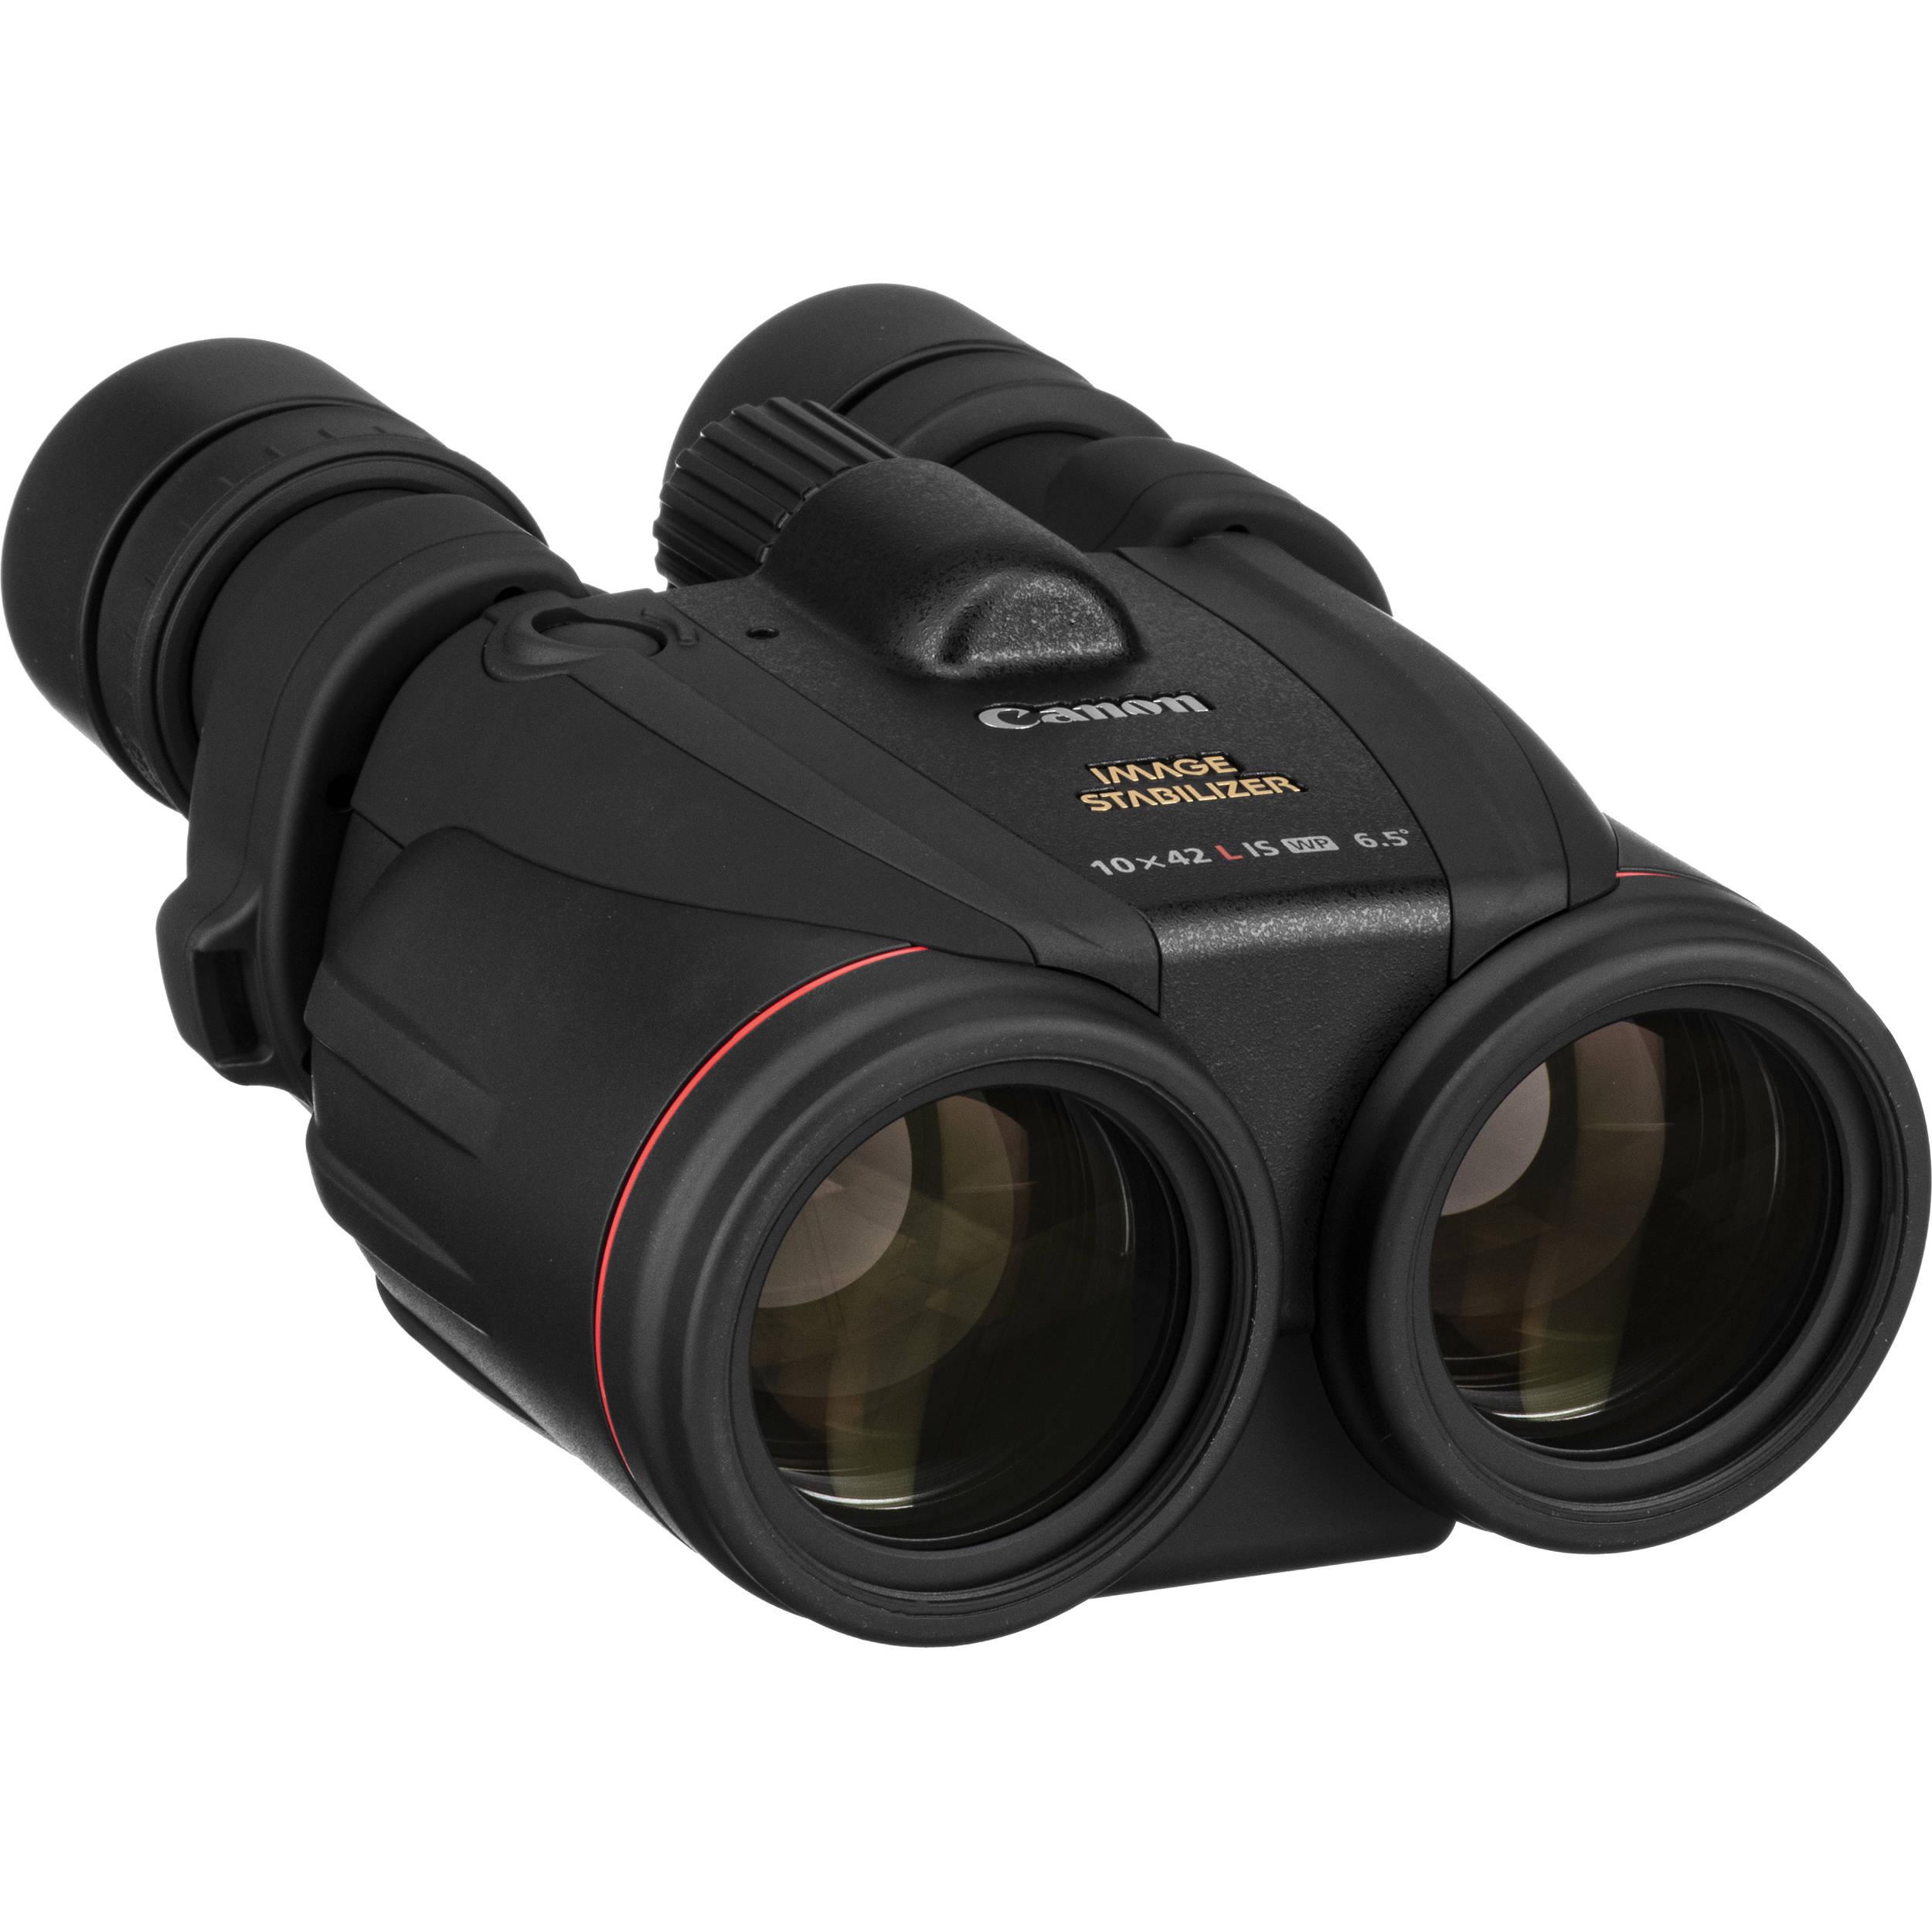 Canon 10X42 L Is Wp Image Stabilized Binocular 0155B002 B&Amp;H